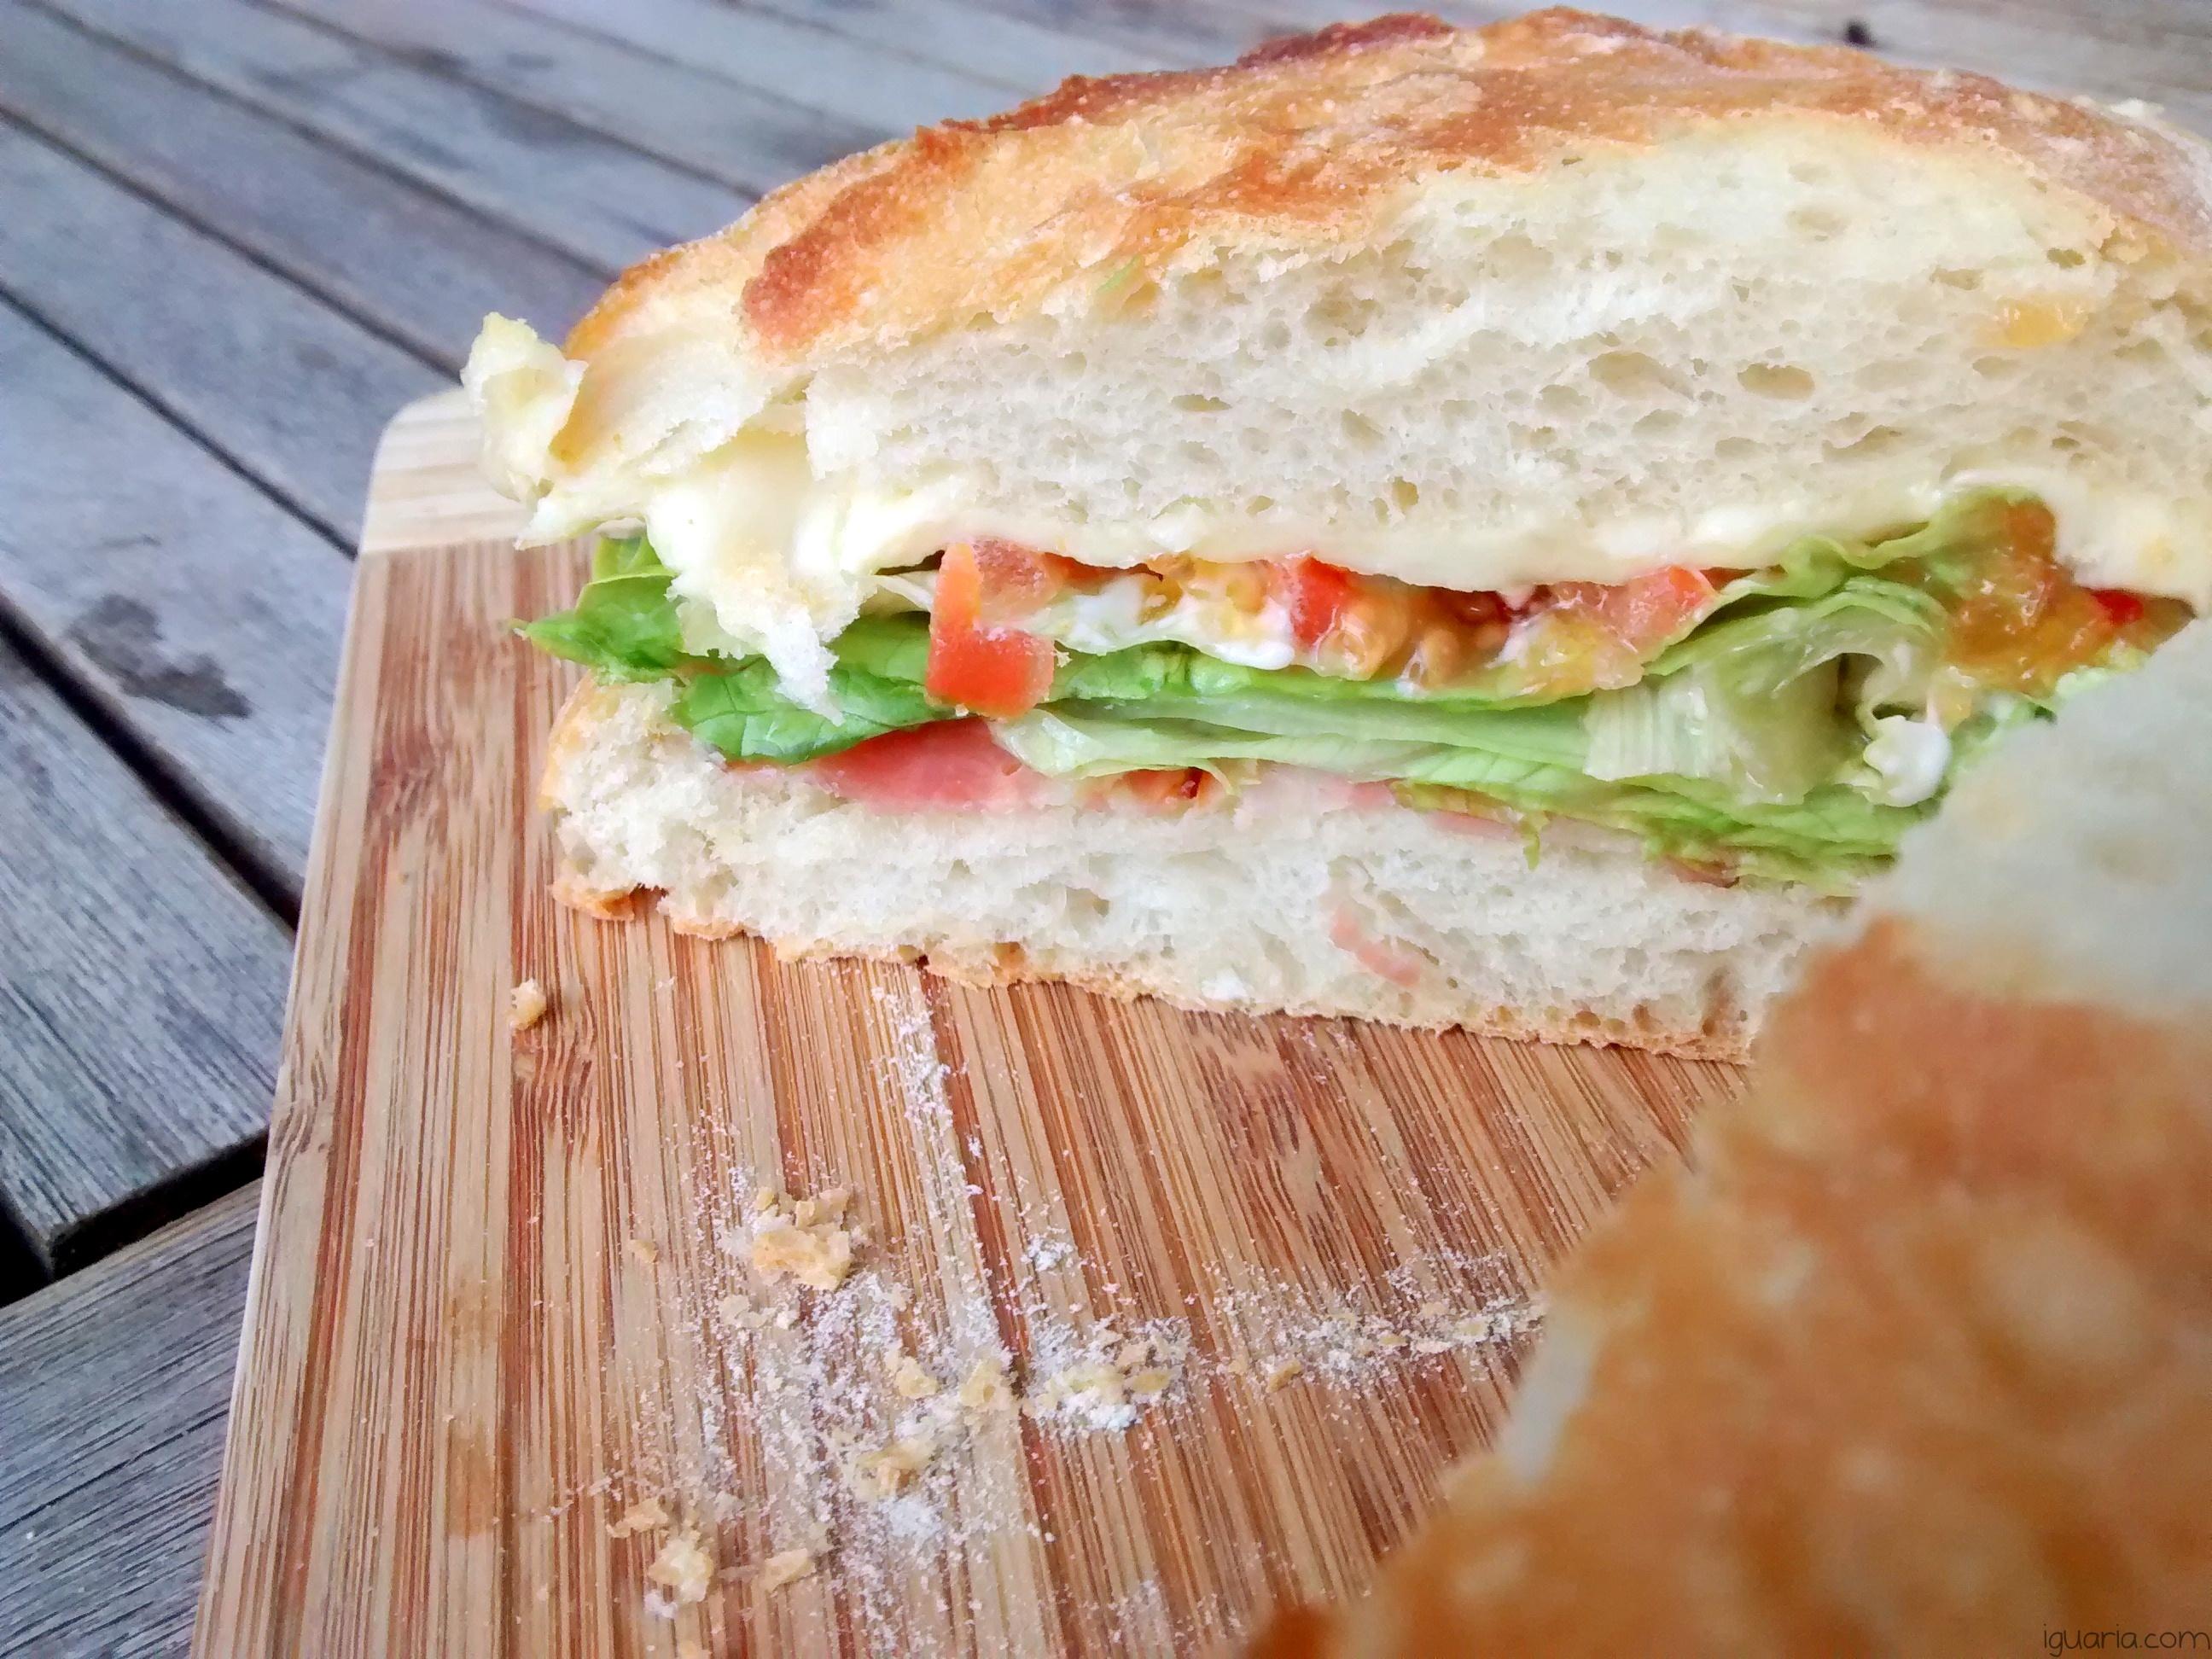 Iguaria_Sandes-Alface-Tomate-Queijo-Toucinho